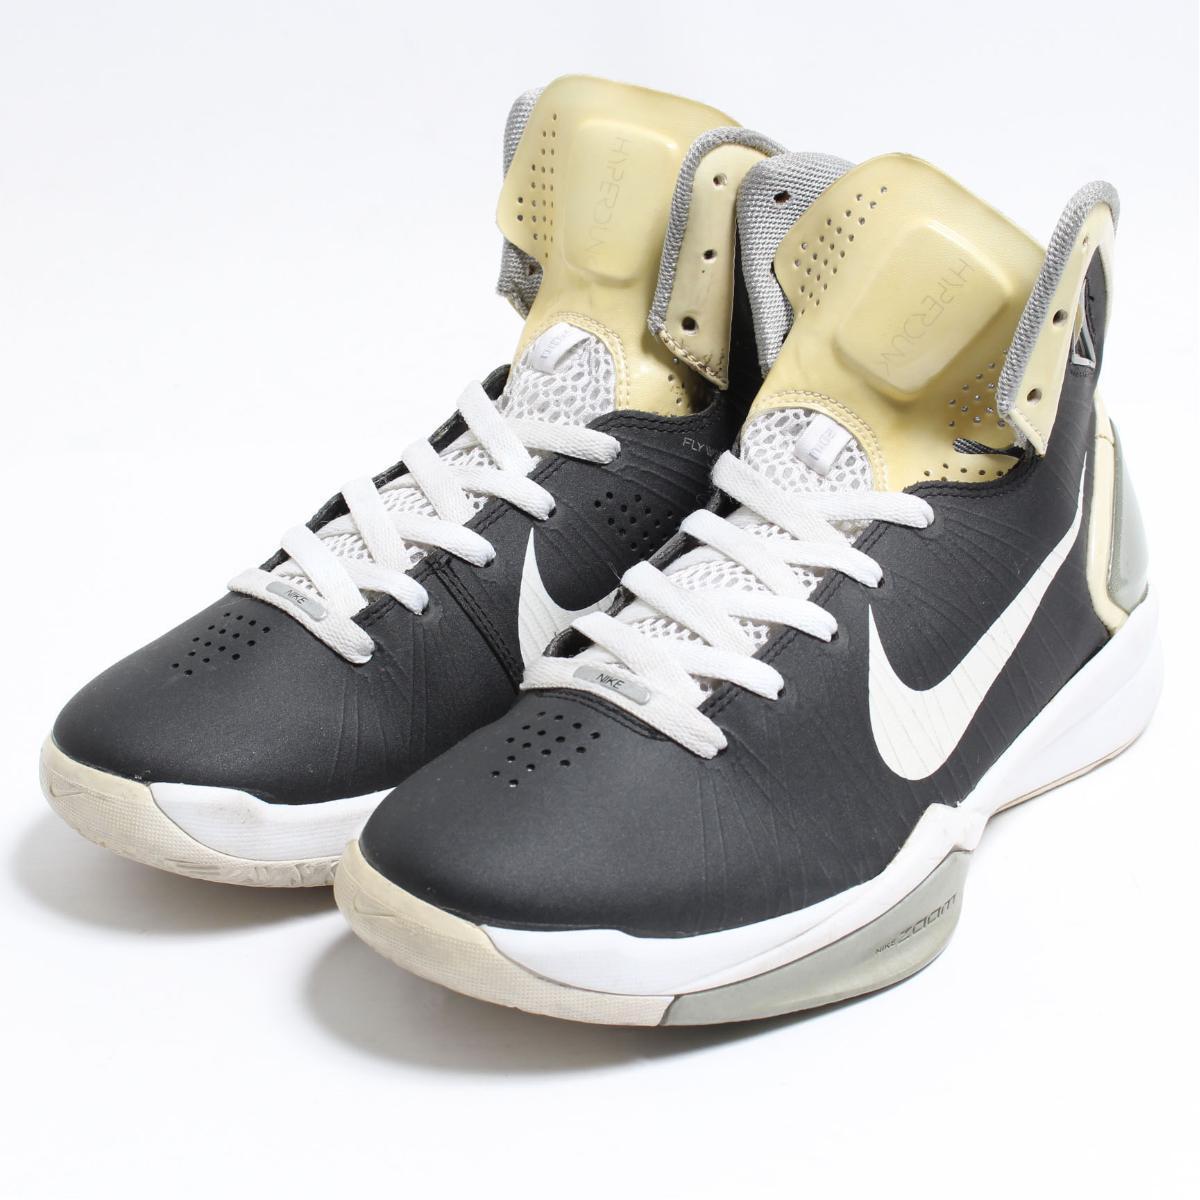 96e30e04b7e8 Nike NIKE HYPERDUNK higher frequency elimination sneakers US7 men 25.0cm   bon4158